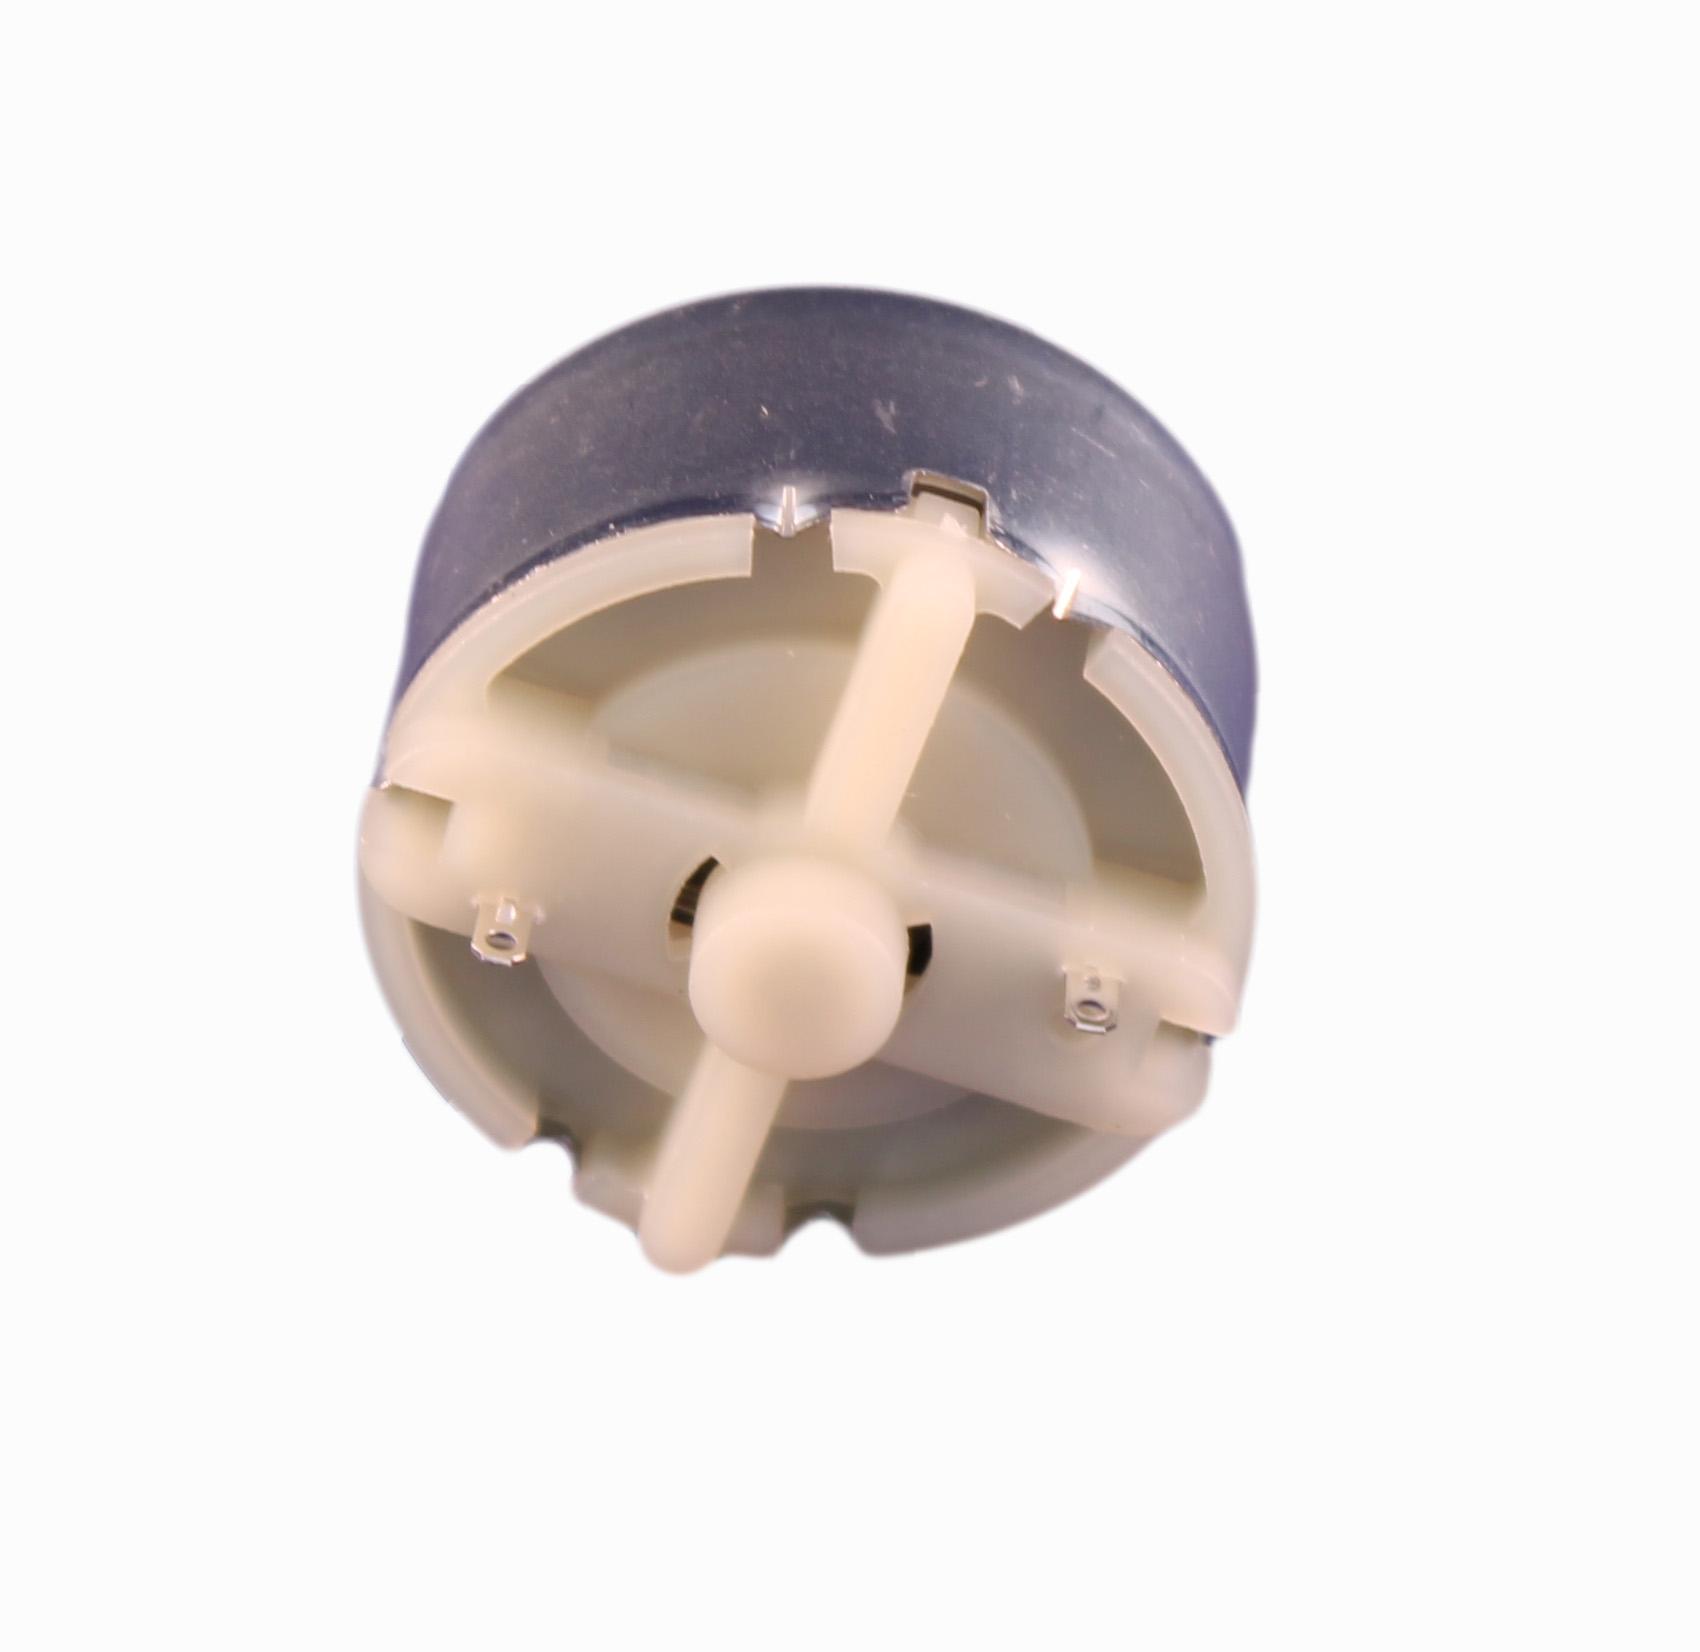 Motor Corriente DC, Voltaje 6.00V, R.P.M. 2650rpm - ARF-500 TB 12560 (Con eje grafilado)